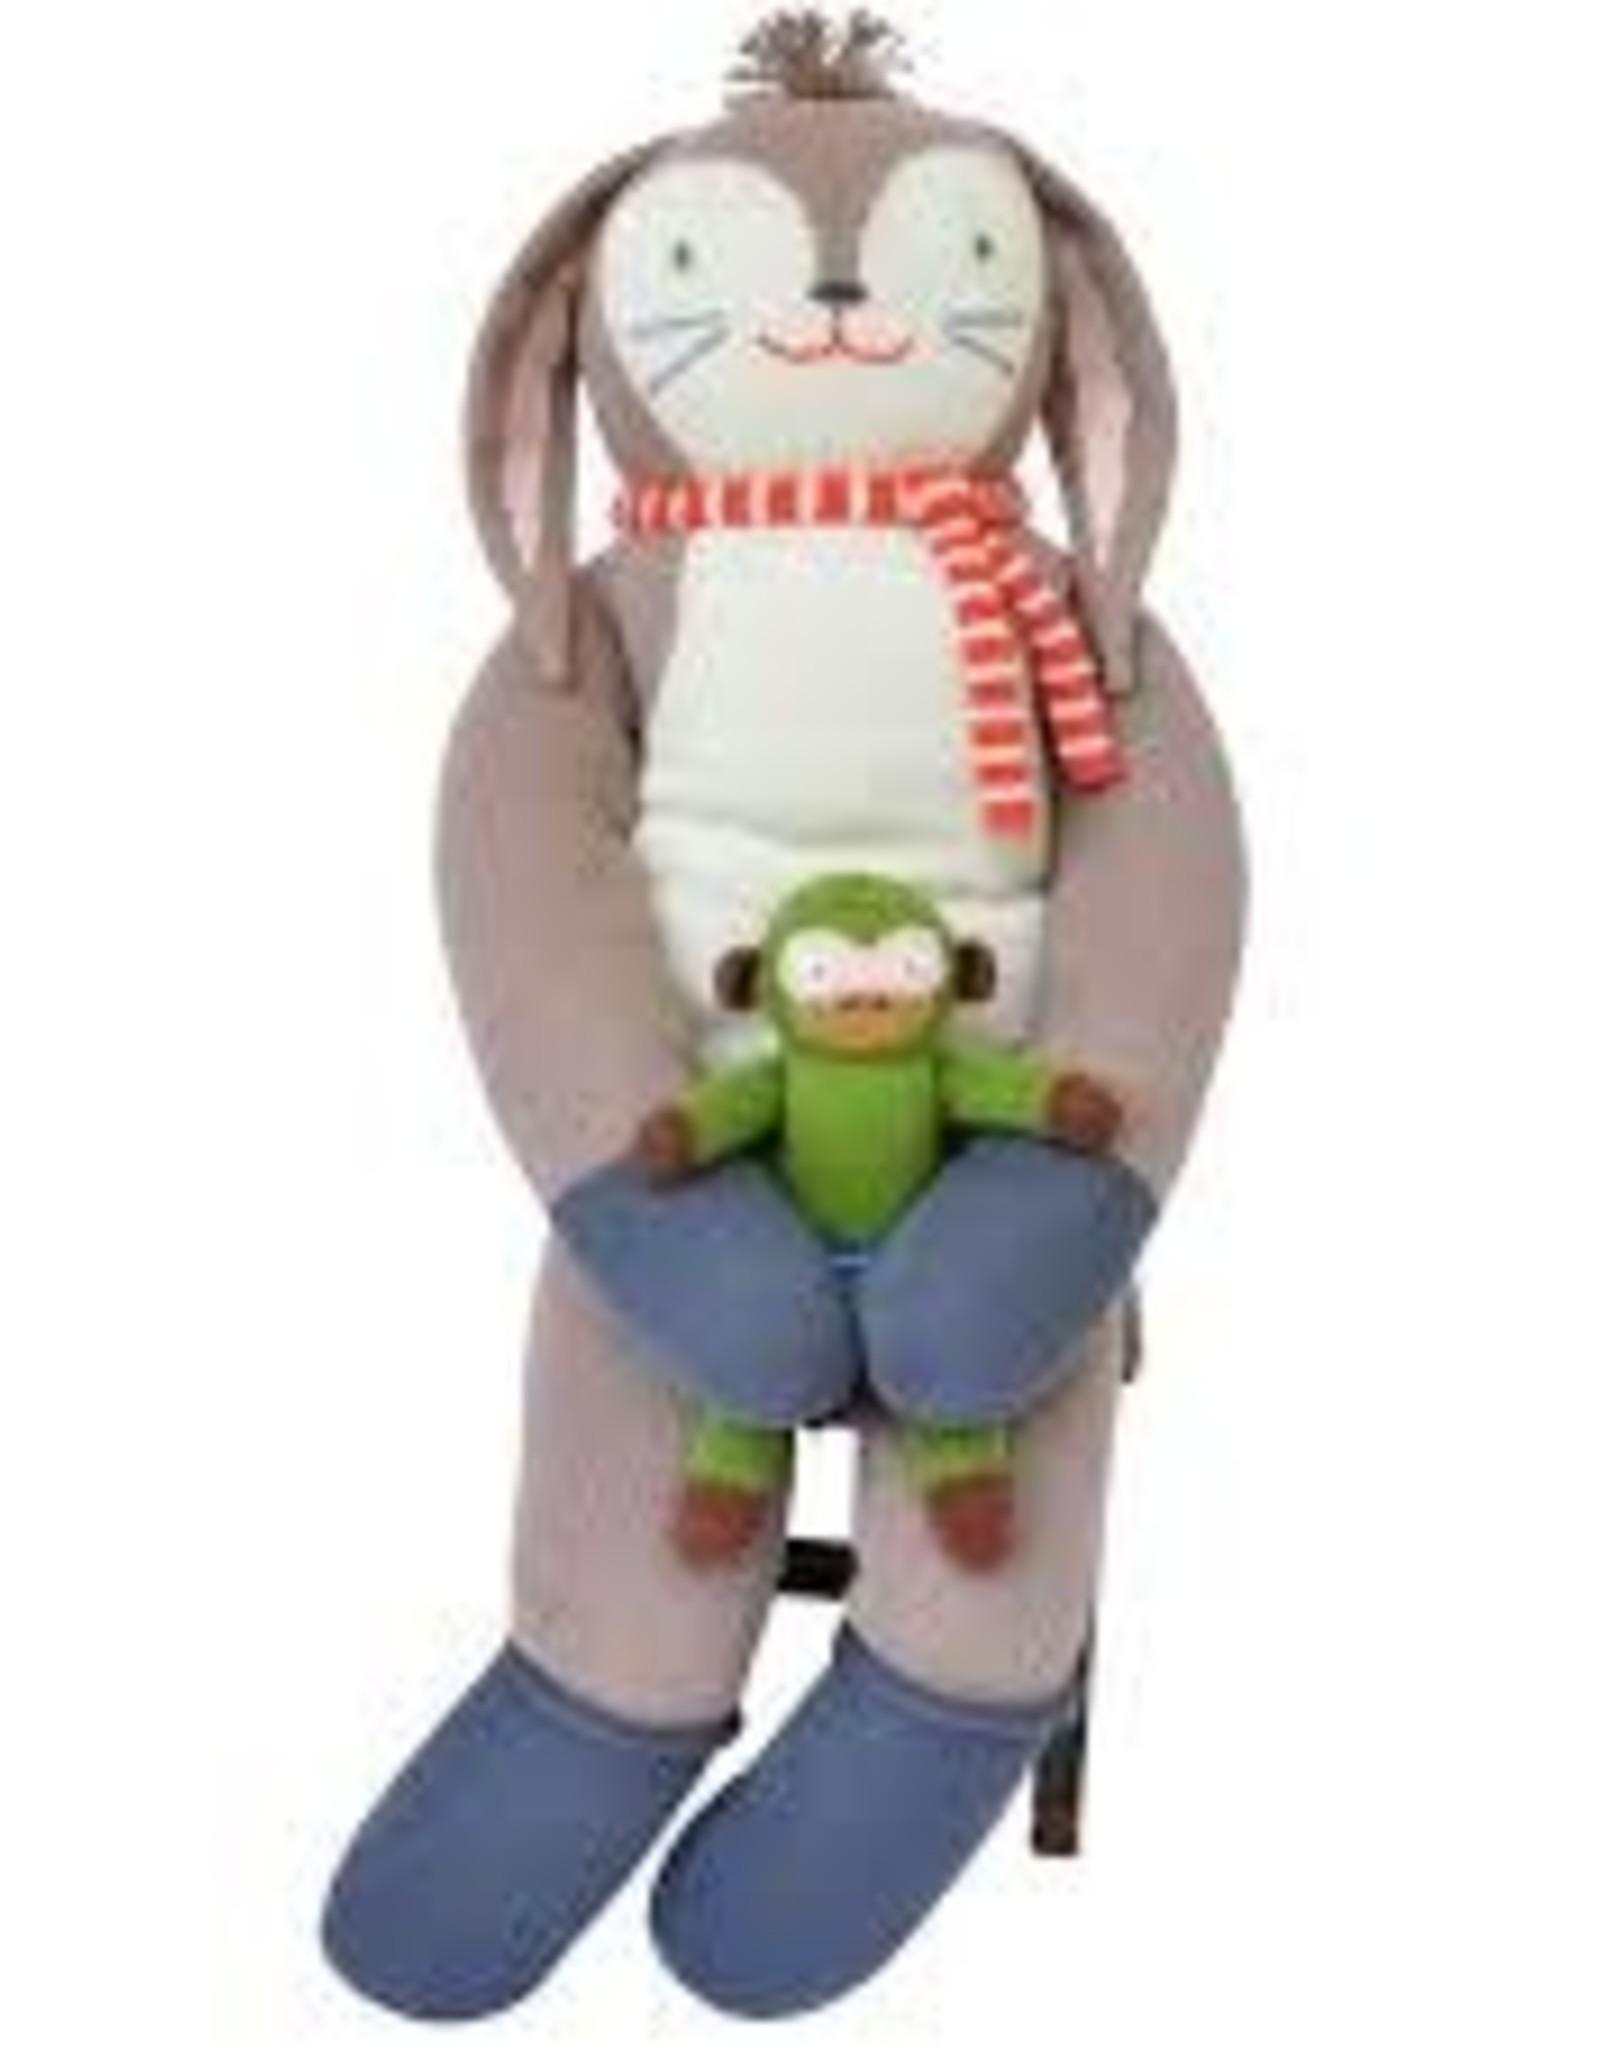 Gifts Giant Blabla Doll